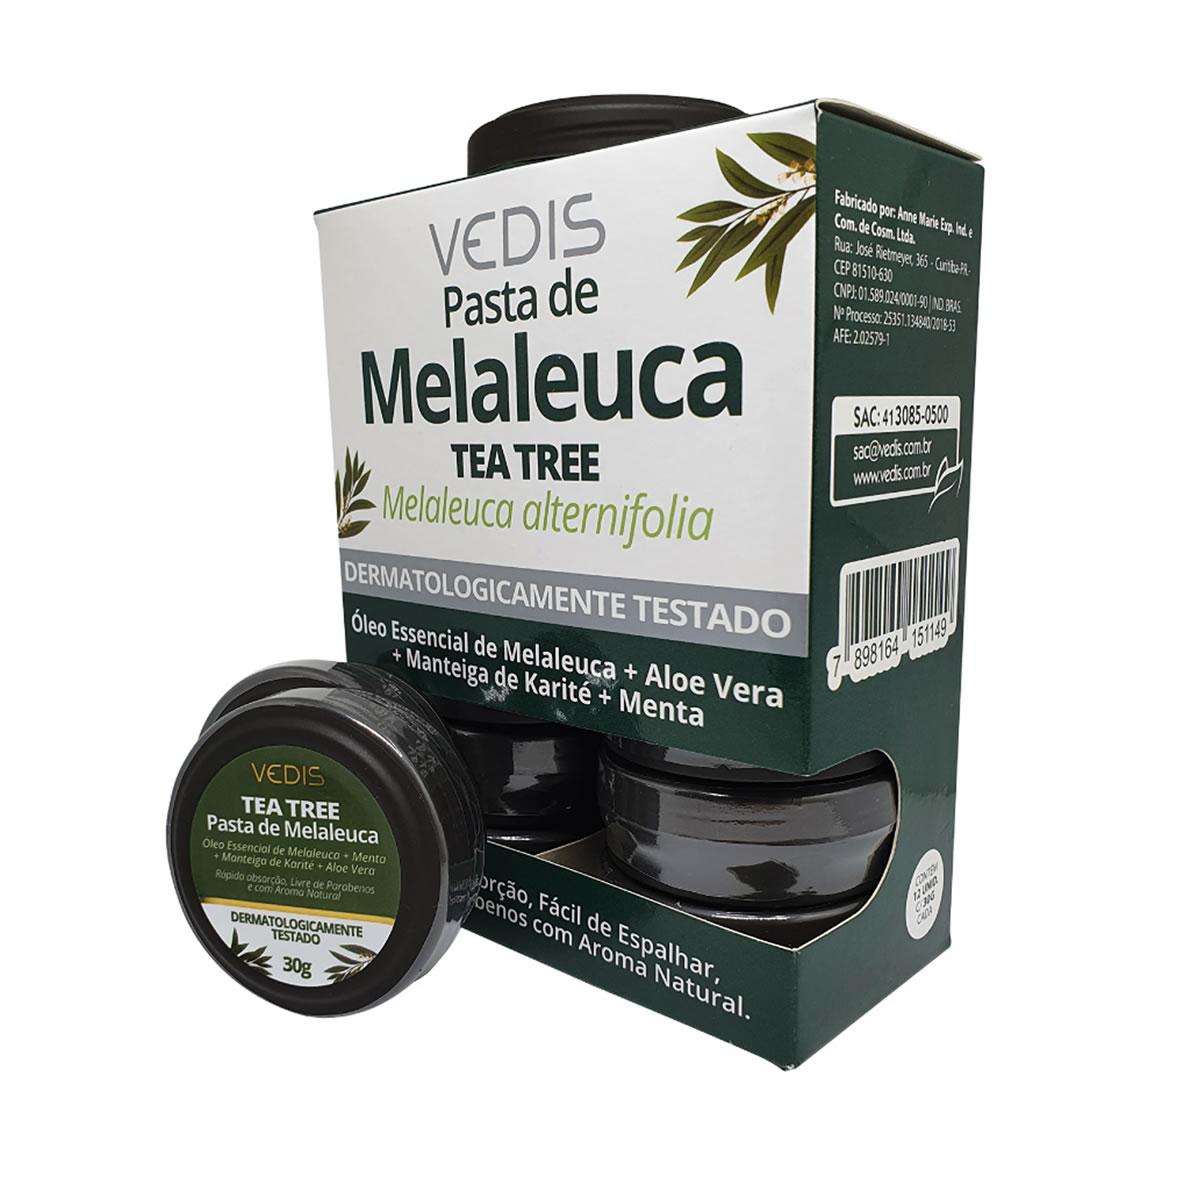 Pasta de Melaleuca para Feridas com Provador Display com 12 un. de 30g - Vedis